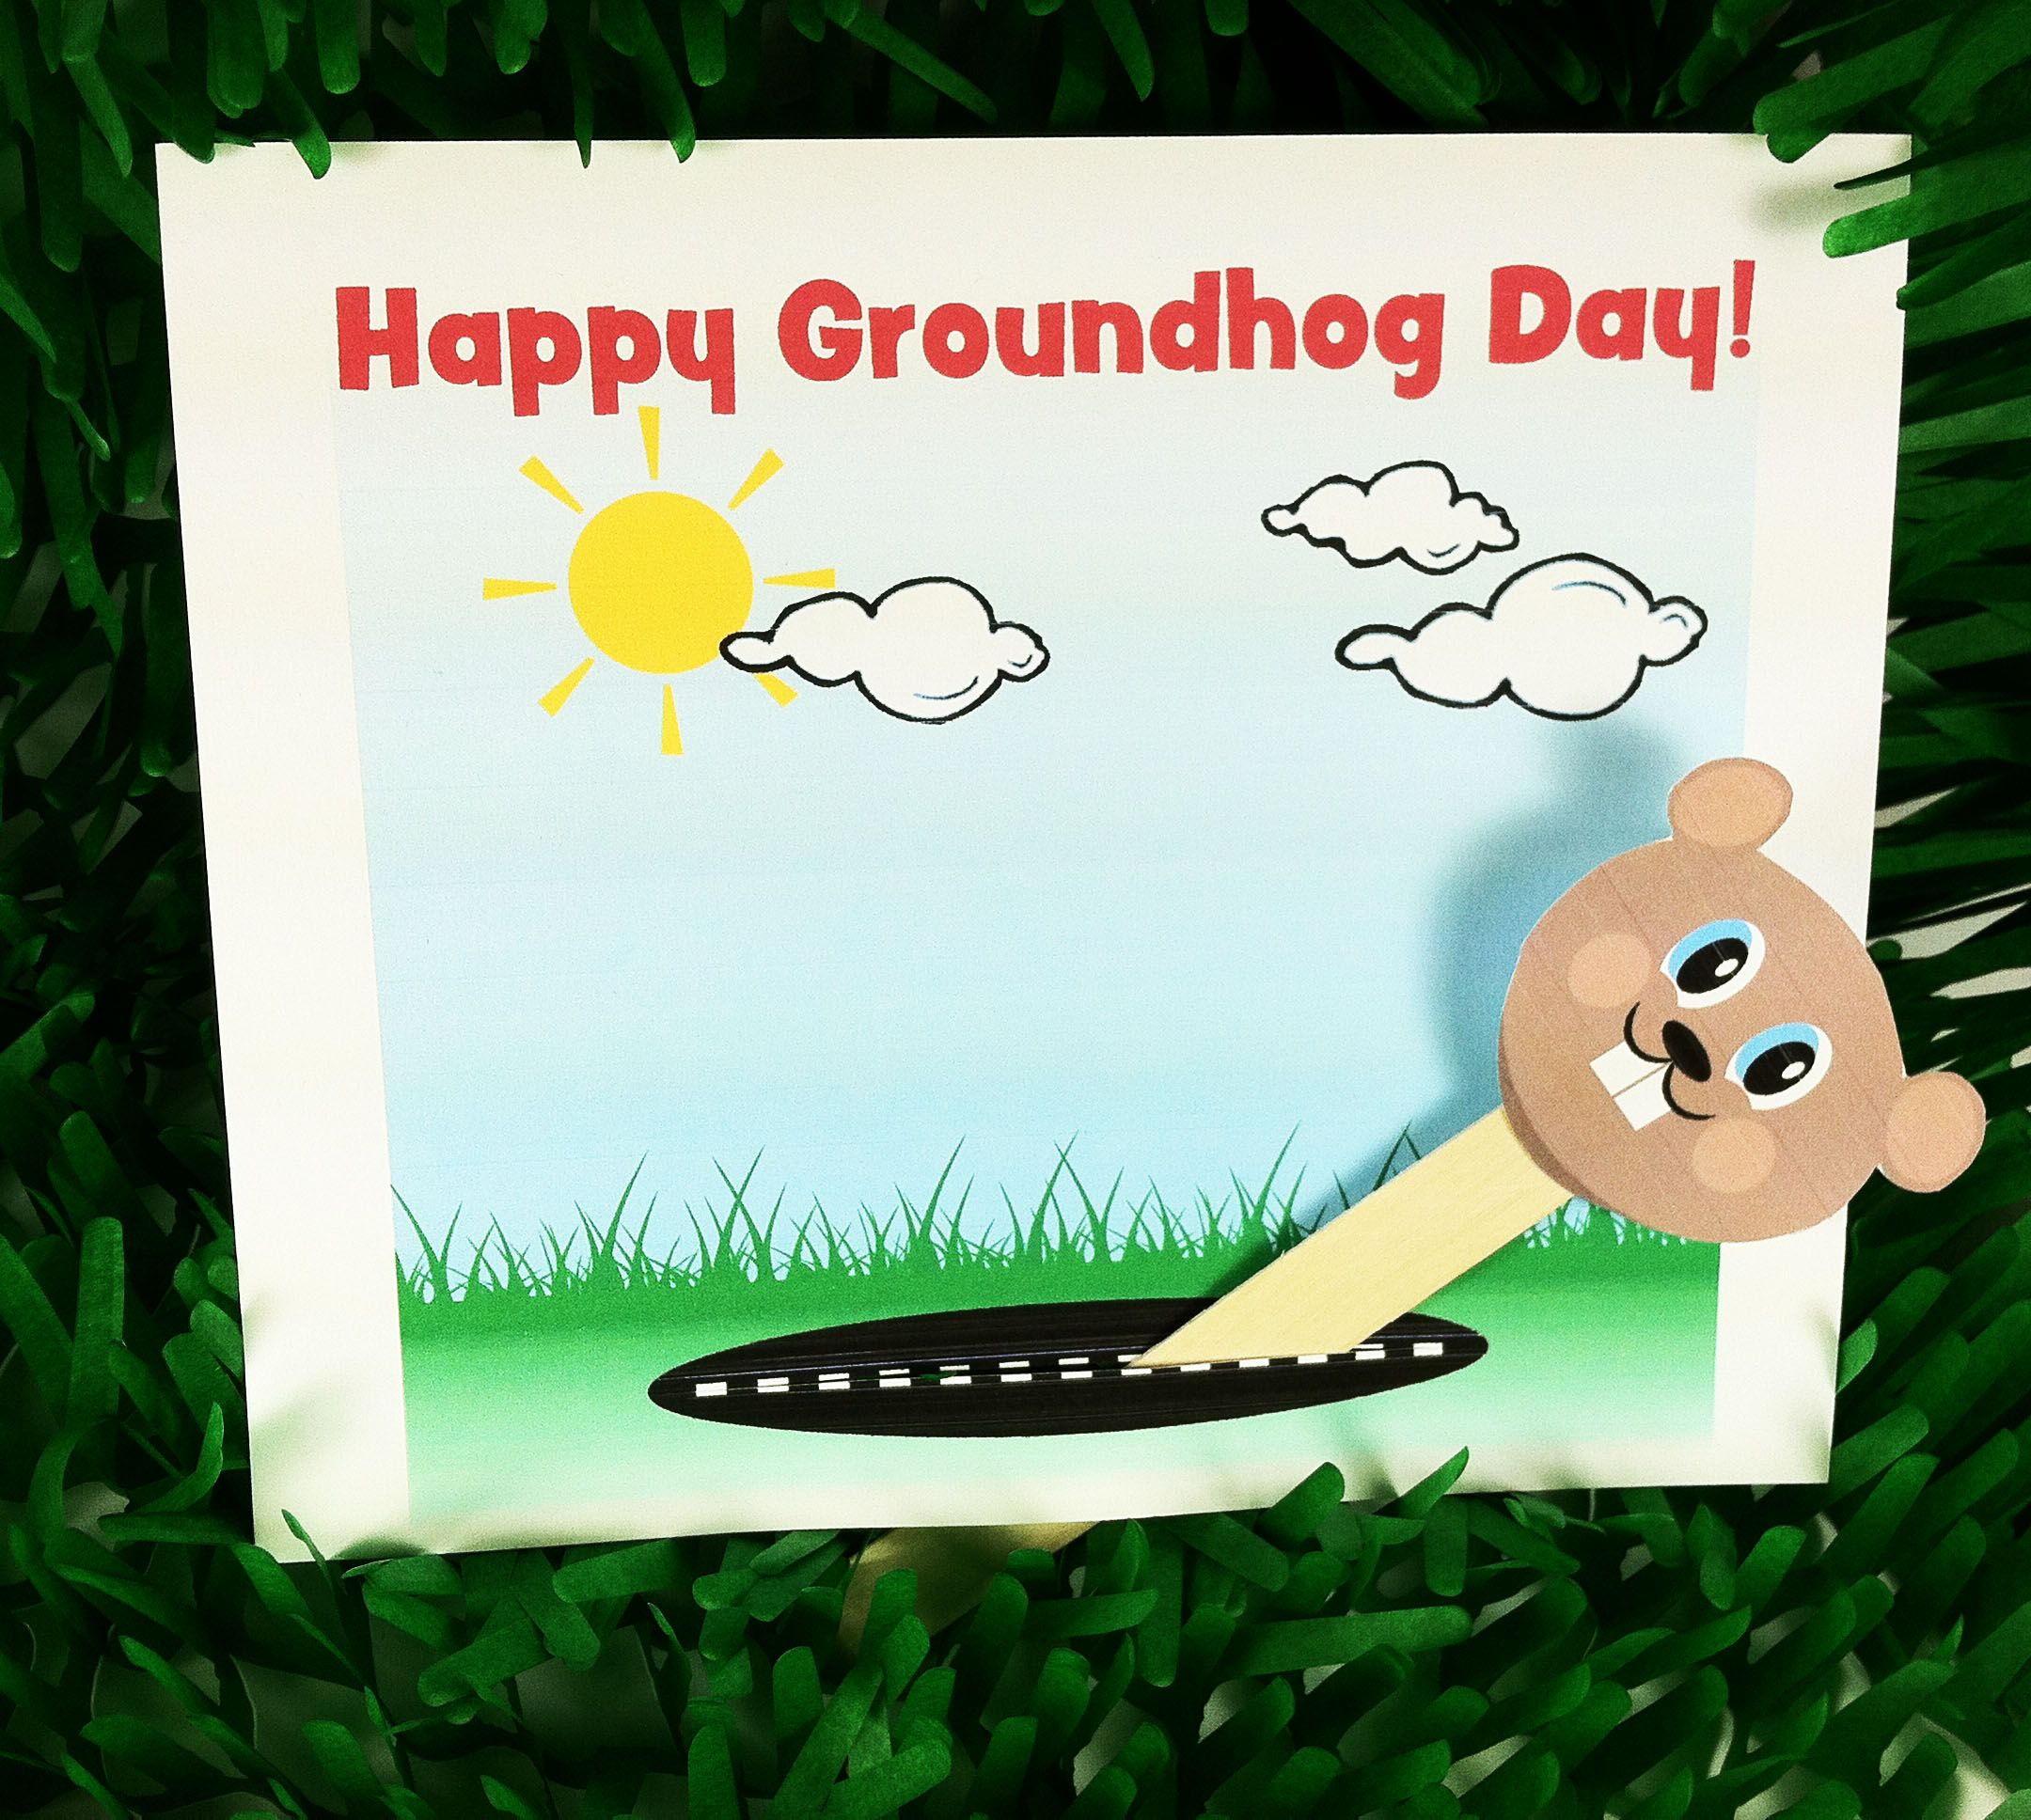 Ground Hog Day Images